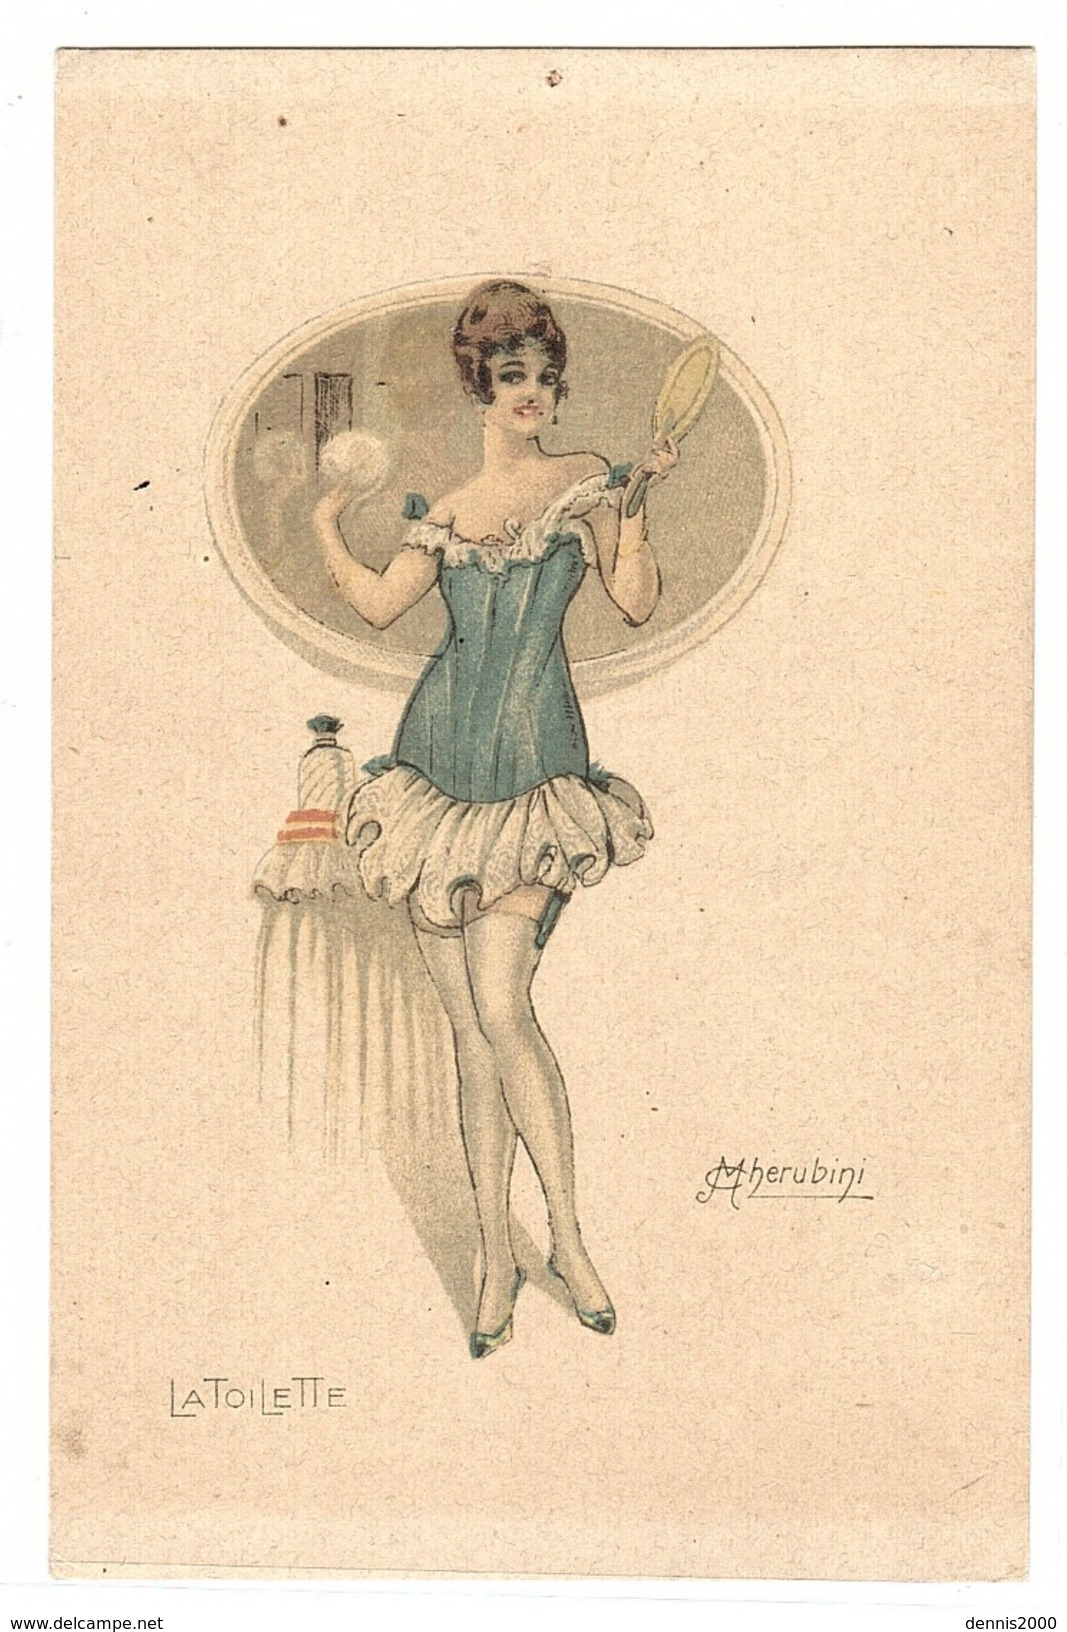 Illustrateur M. CHERUBINI - FEMME - MODE - EROTISME - WOMAN - FASHION - LA TOILETTE - Stampa Milano 3686 - 959/2 - Women